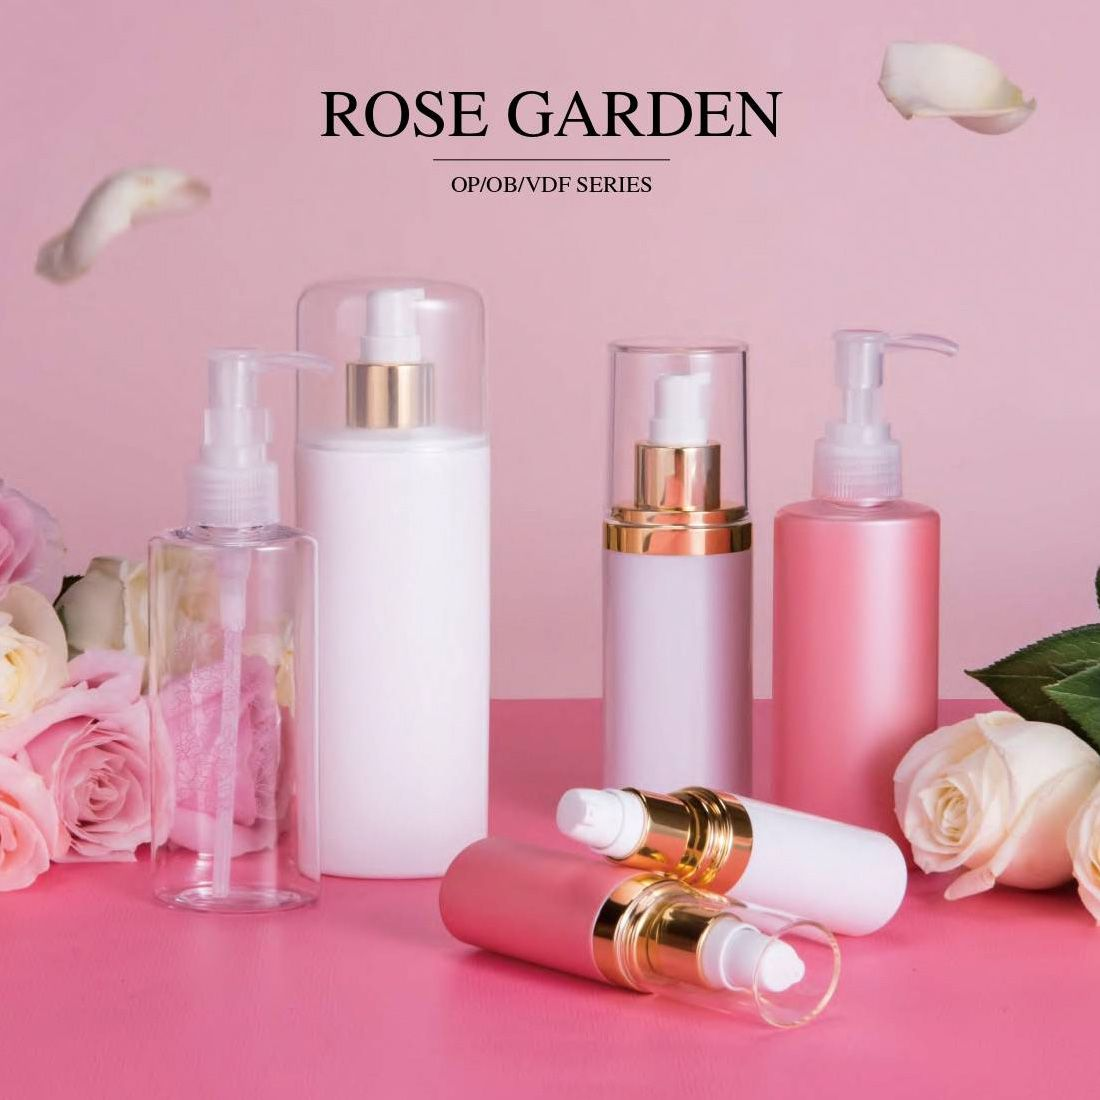 COSJAR cometic container design - Rose garden series